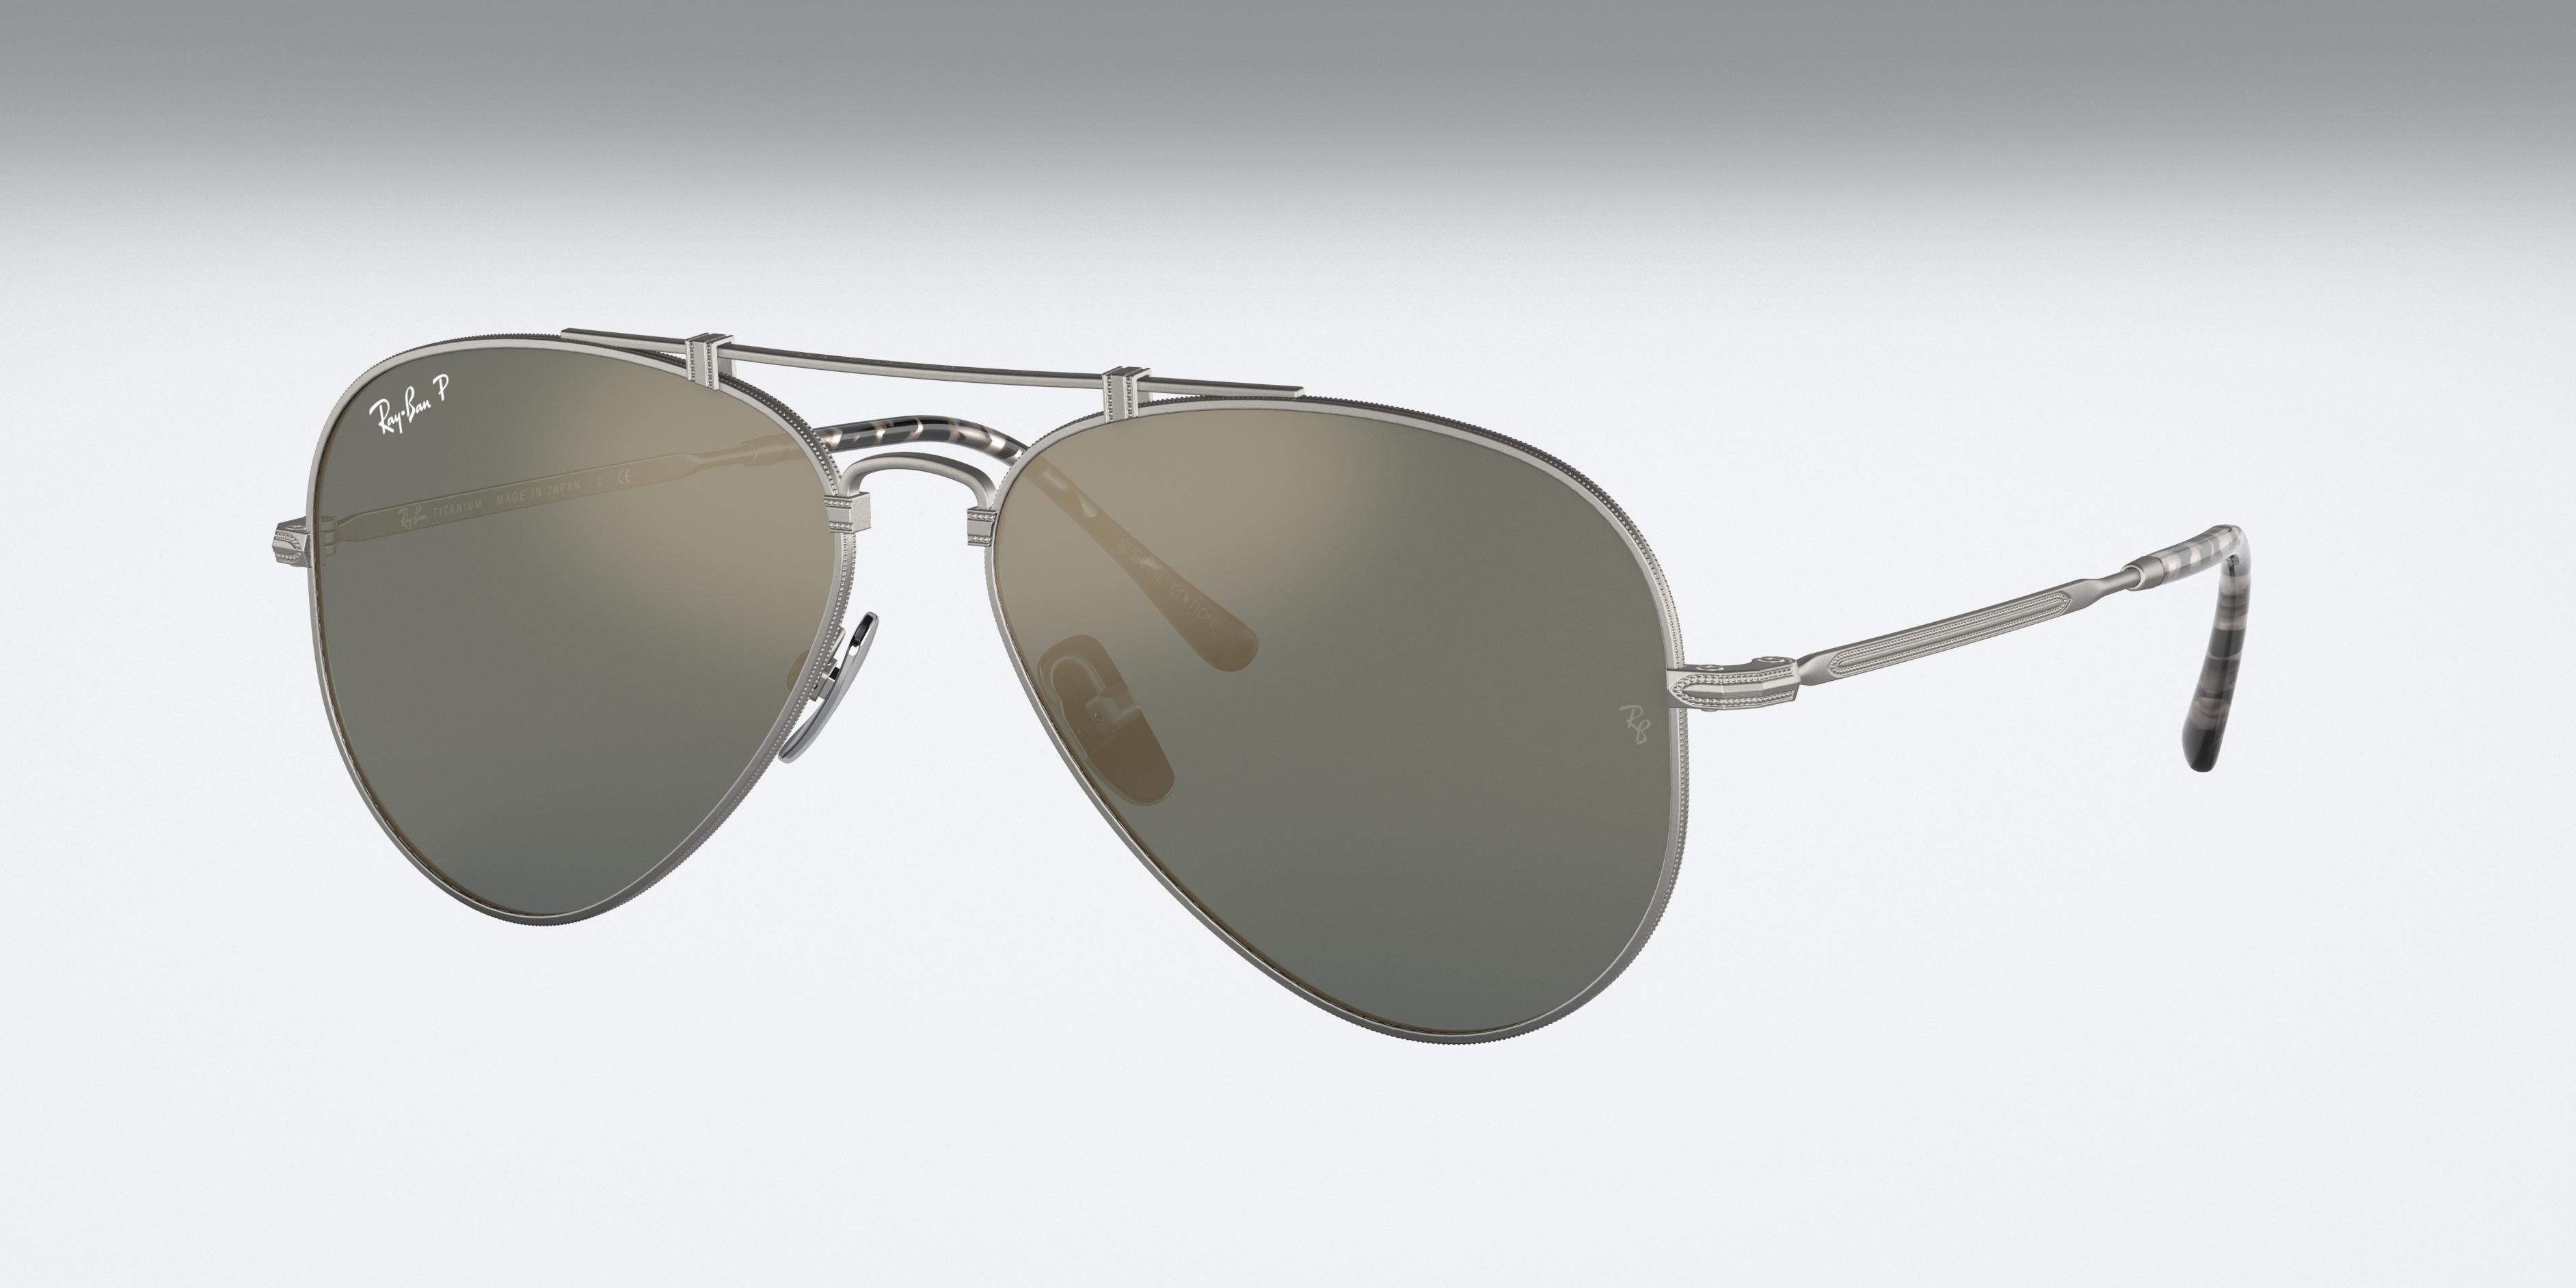 Ray-Ban Aviator Titanium Silver, Polarized Blue Lenses - RB8125M